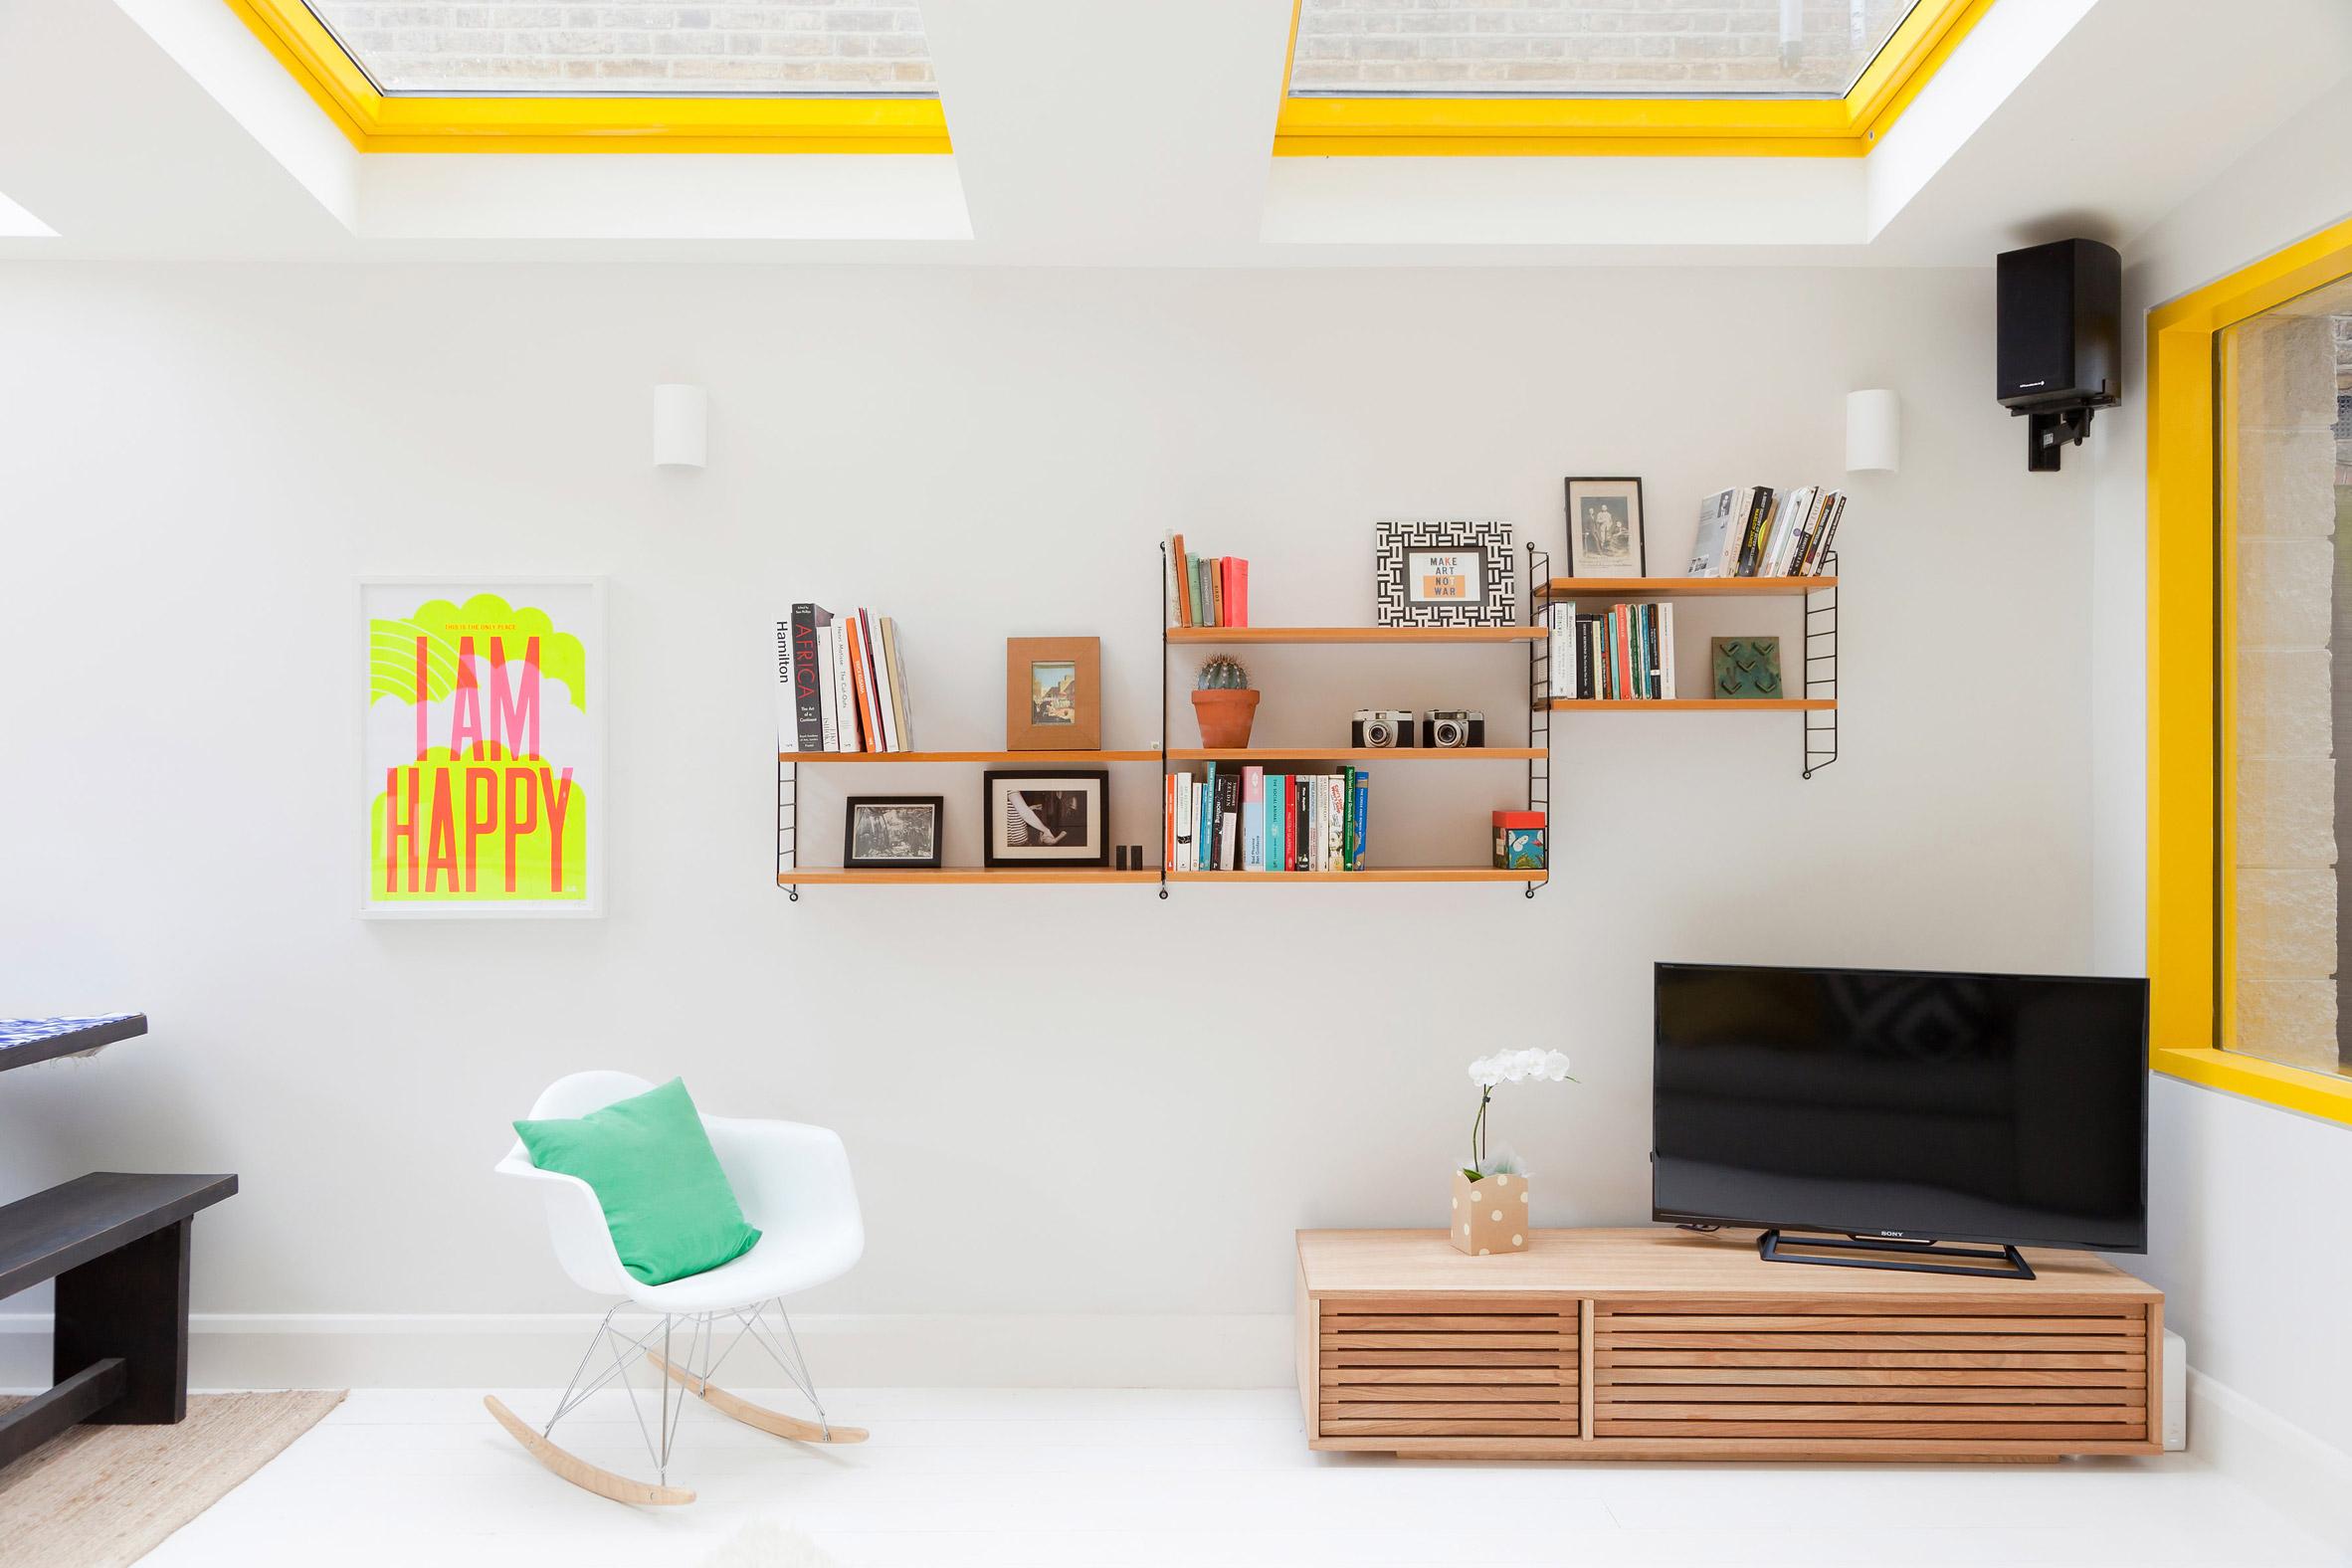 yellow-house-nimtim-architects-interior-london-extensions_dezeen_2364_col_4